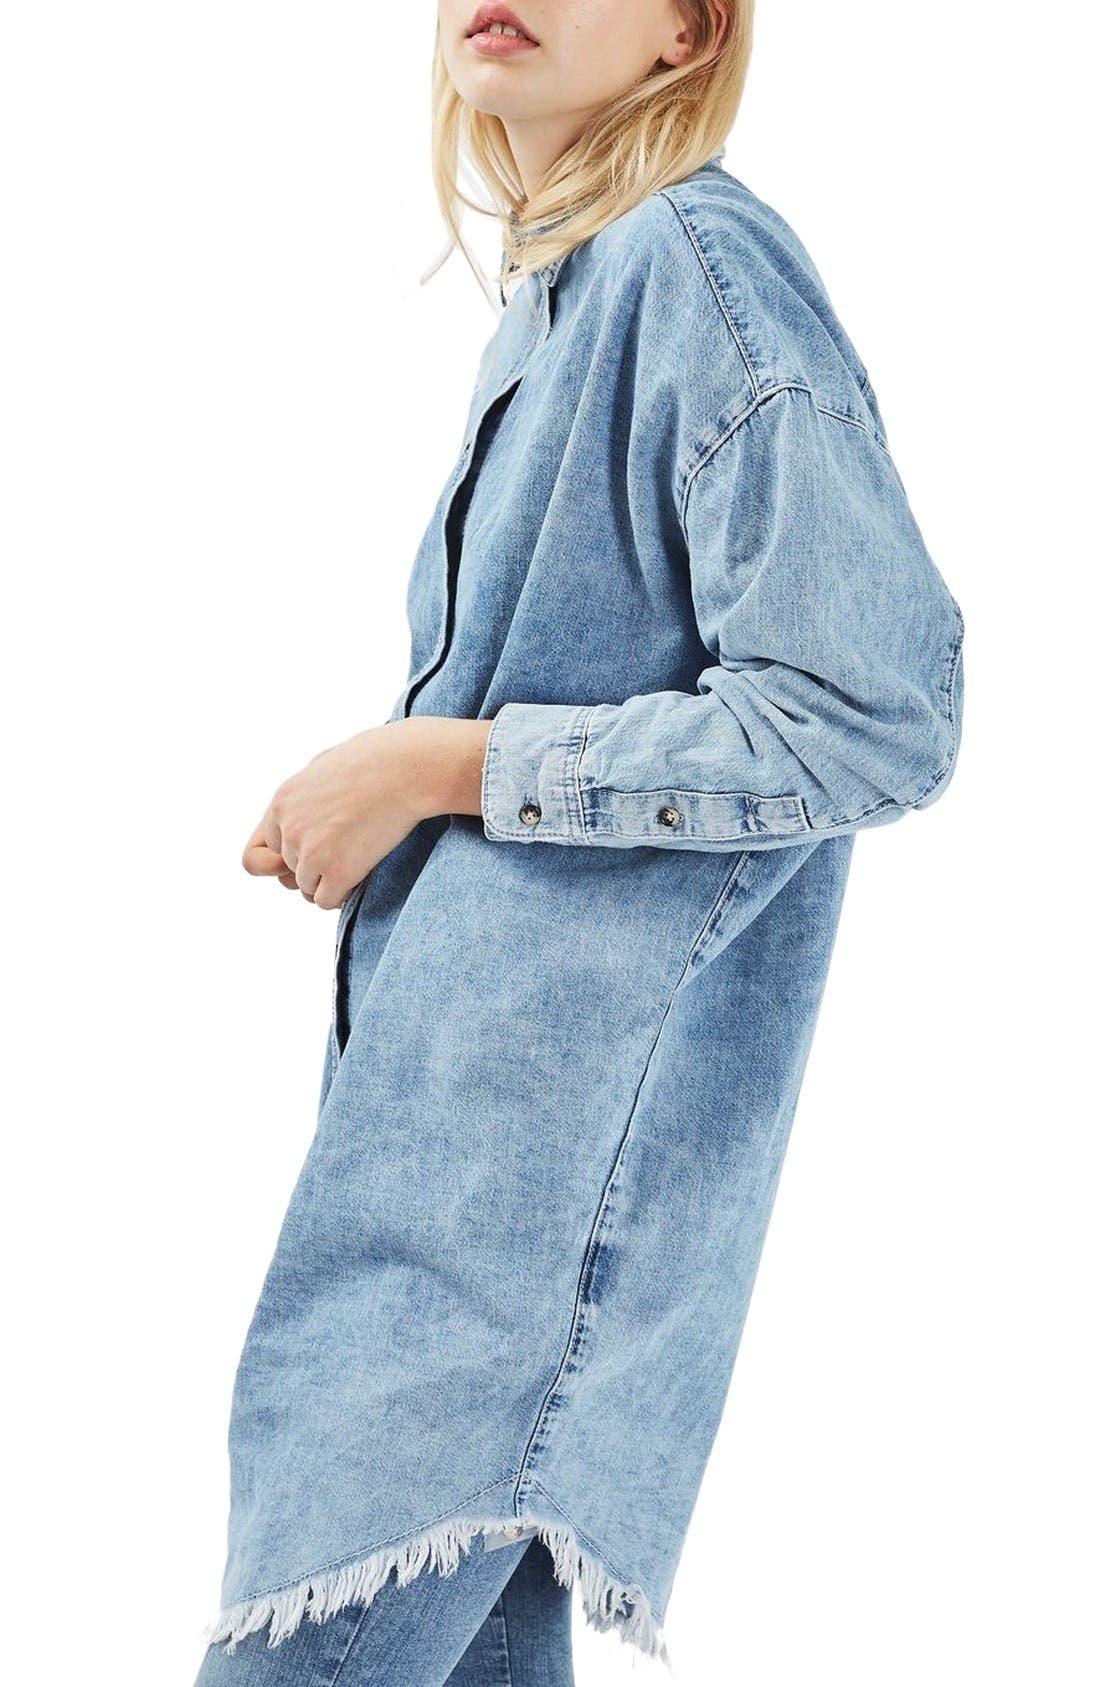 Alternate Image 1 Selected - Topshop Elton Fray Denim Shirtdress